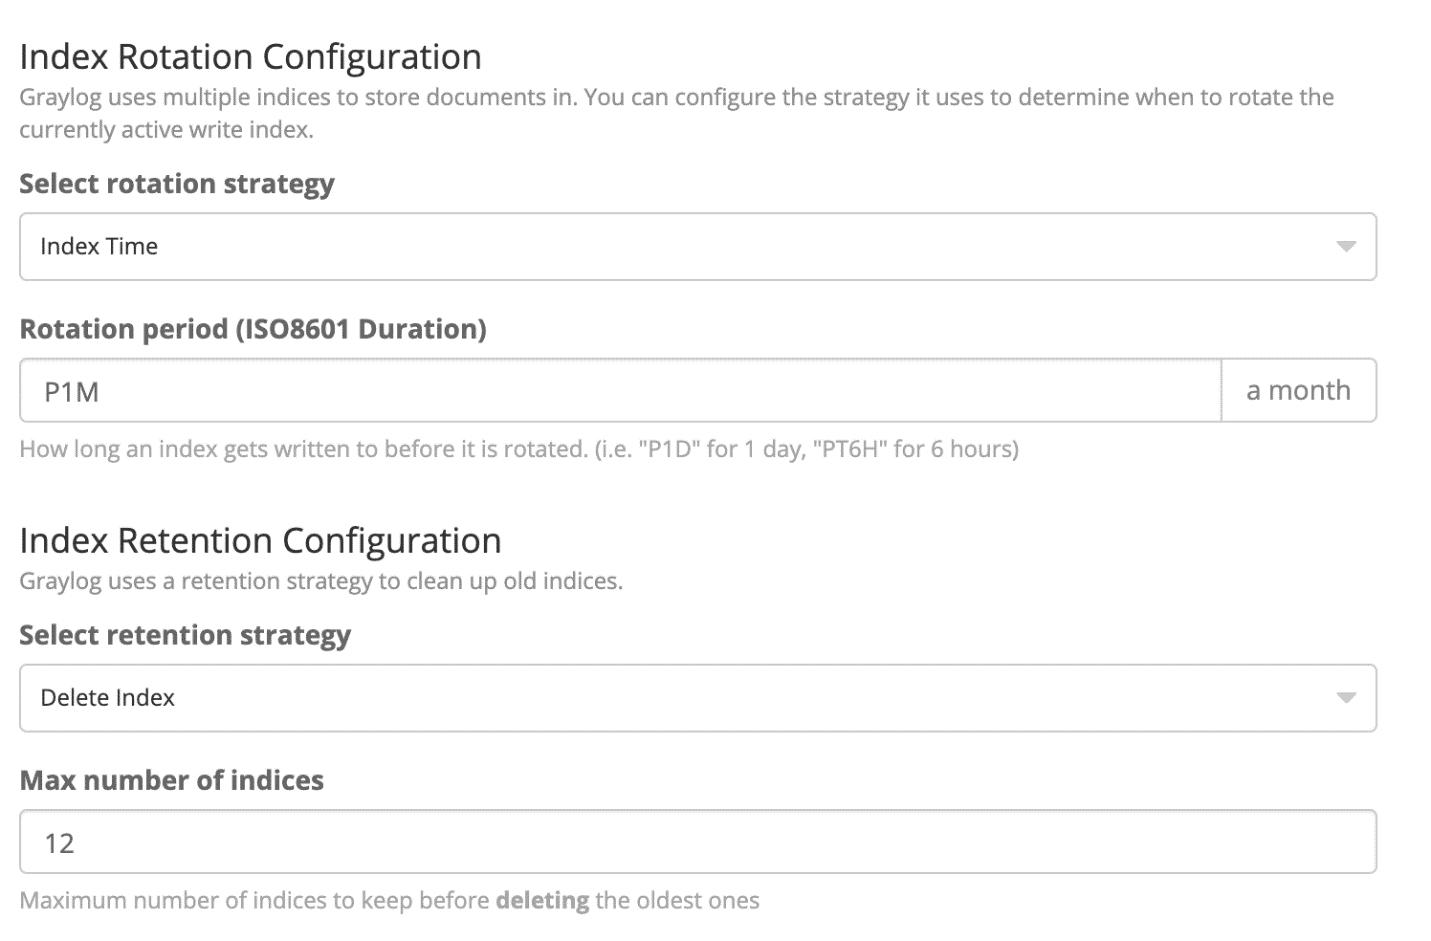 Index Rotation Configuration